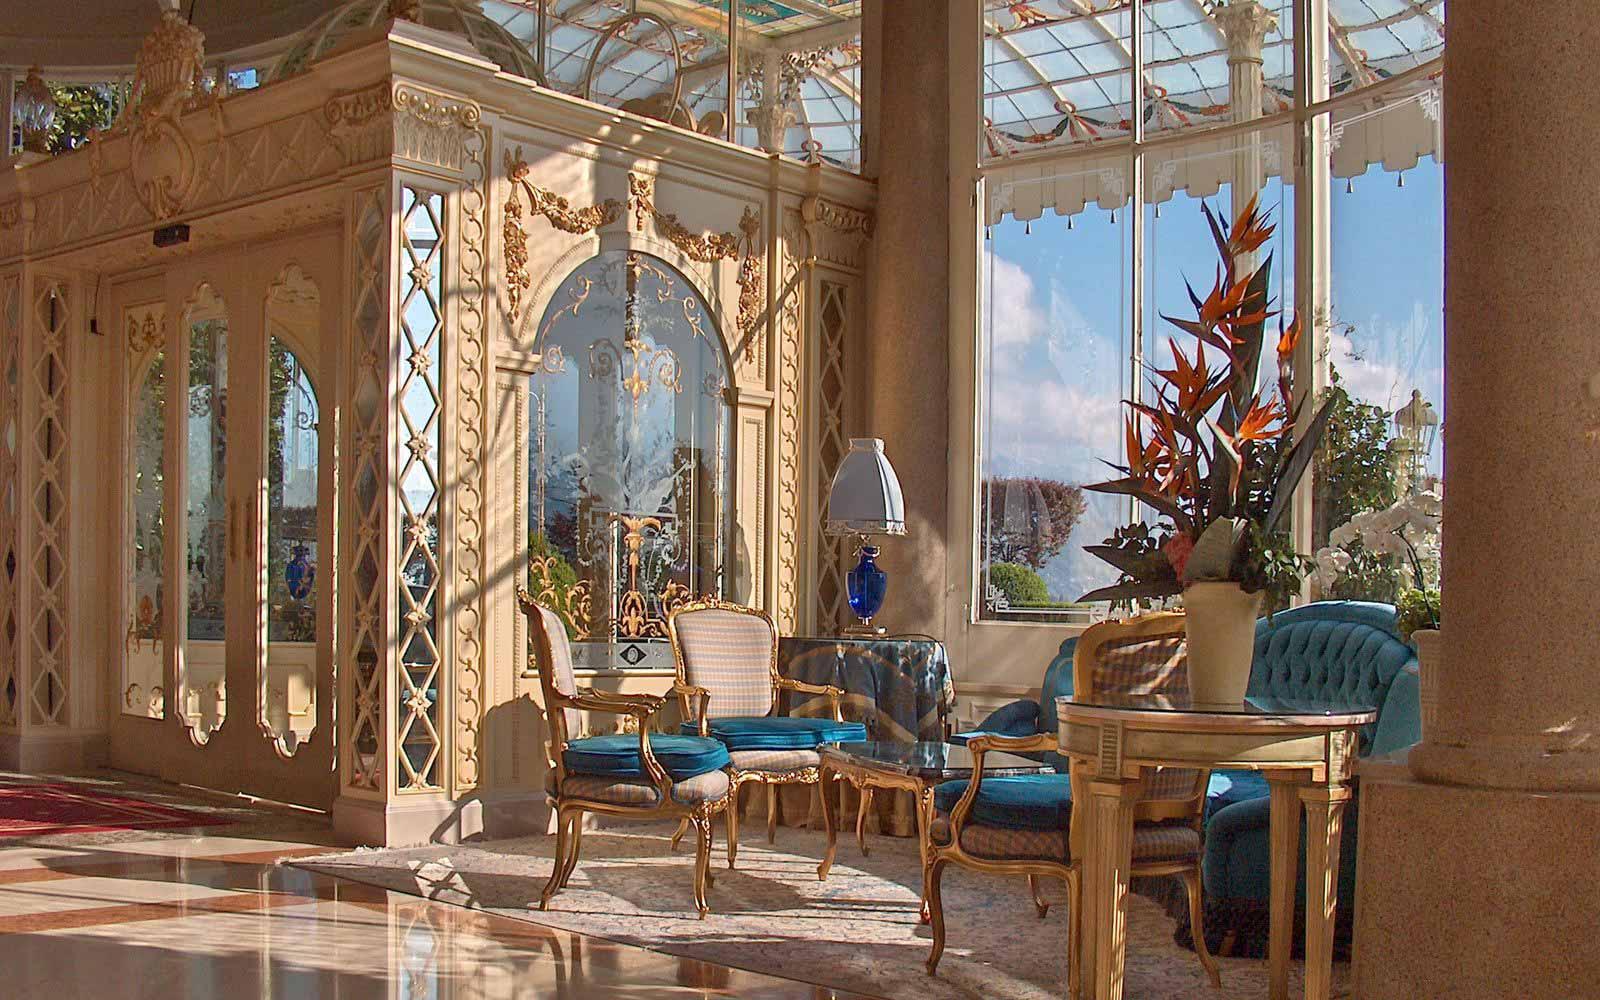 Reception hall at Grand Hotel Des Iles Borromees